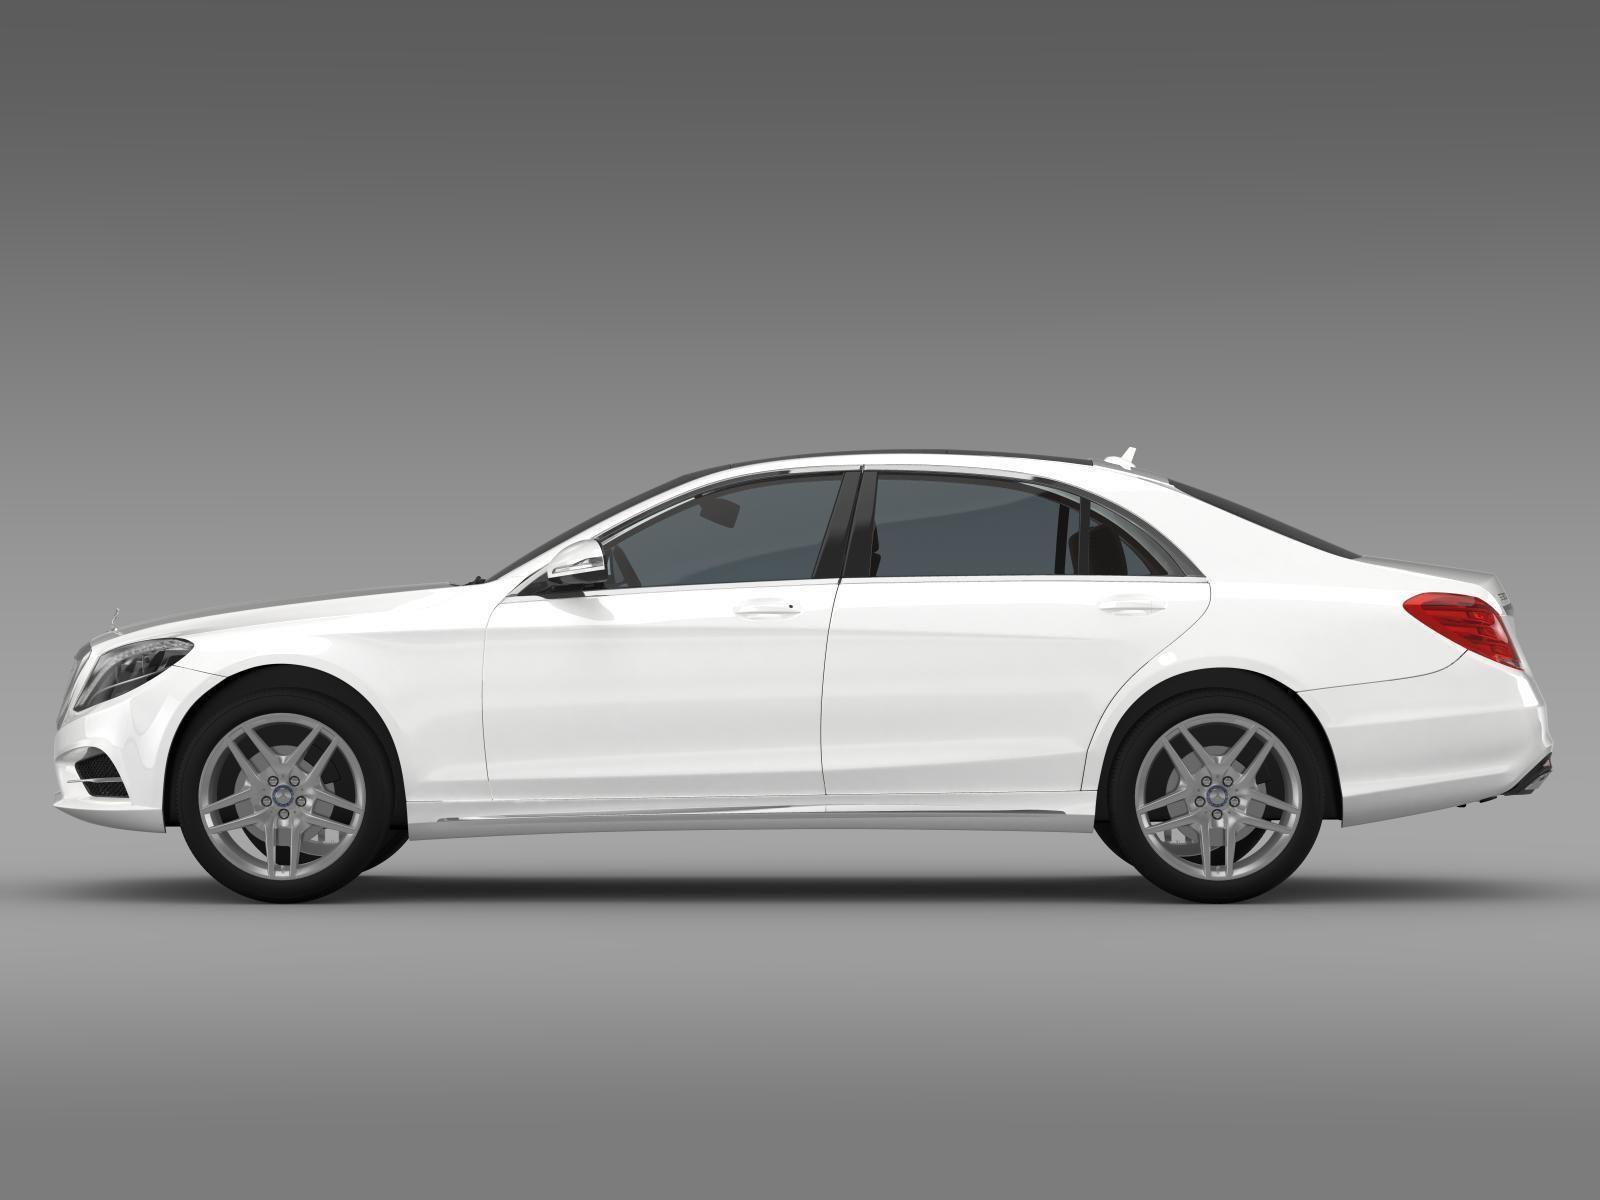 Mercedes benz s 300 lang bluetec hybrid v222 2016 3d model for Mercedes benz hybrid models